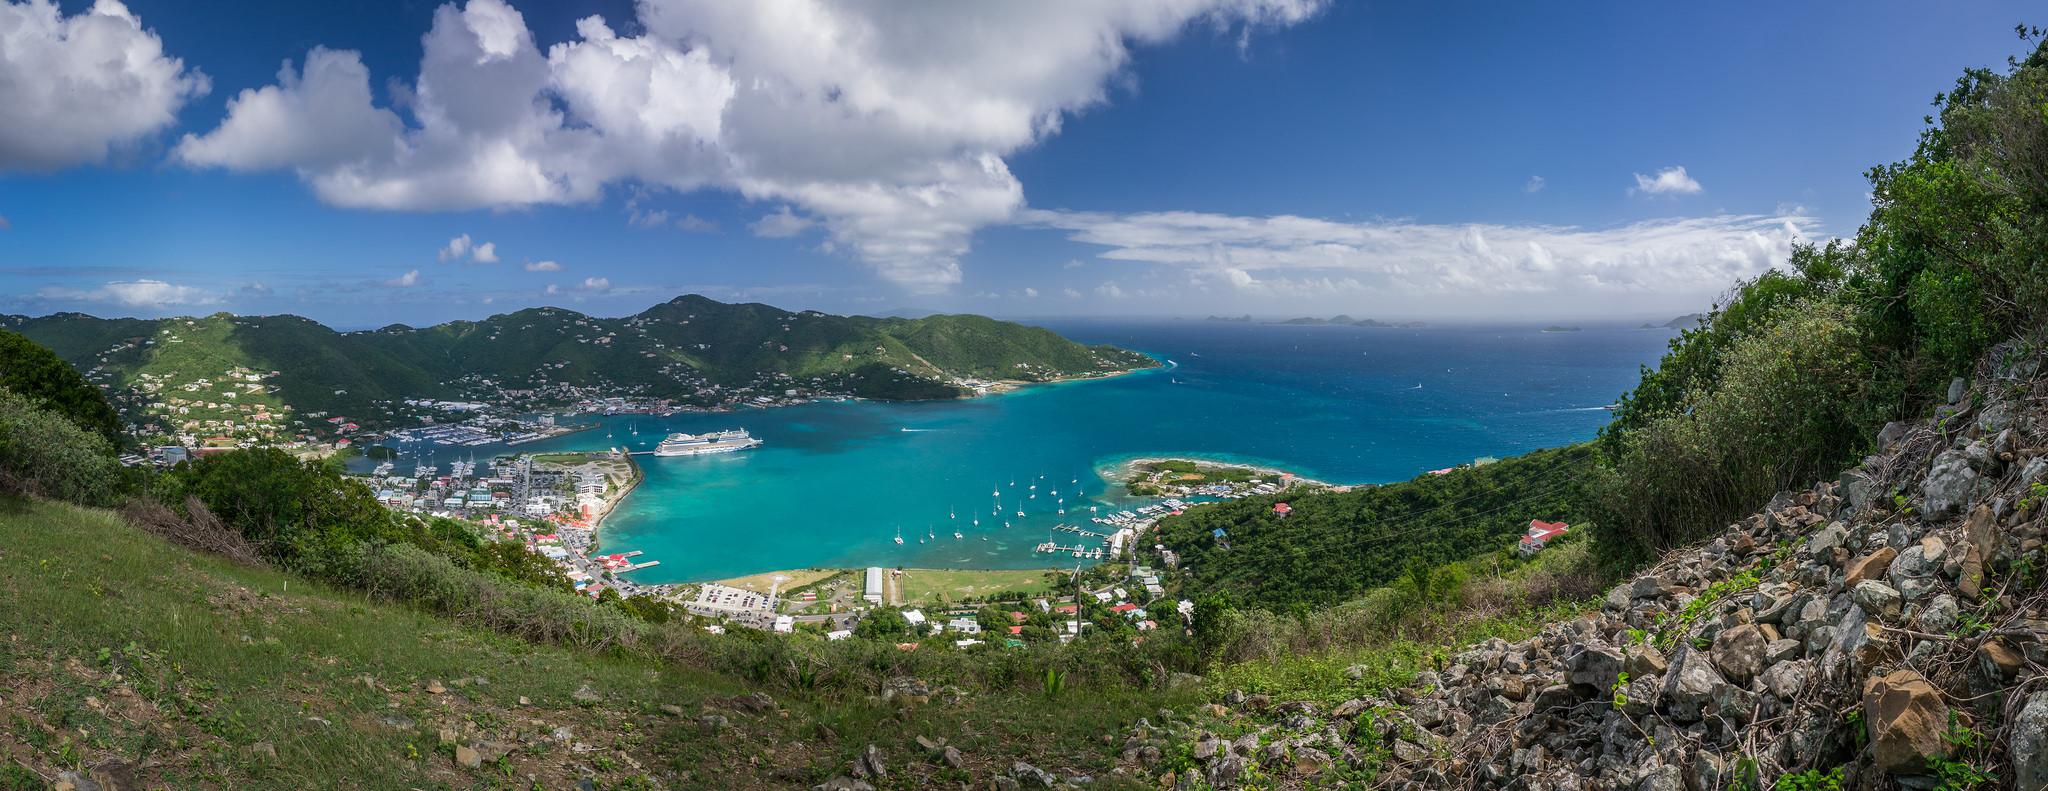 Road Town, Tortola, British Virgin Island sailing Zizoo